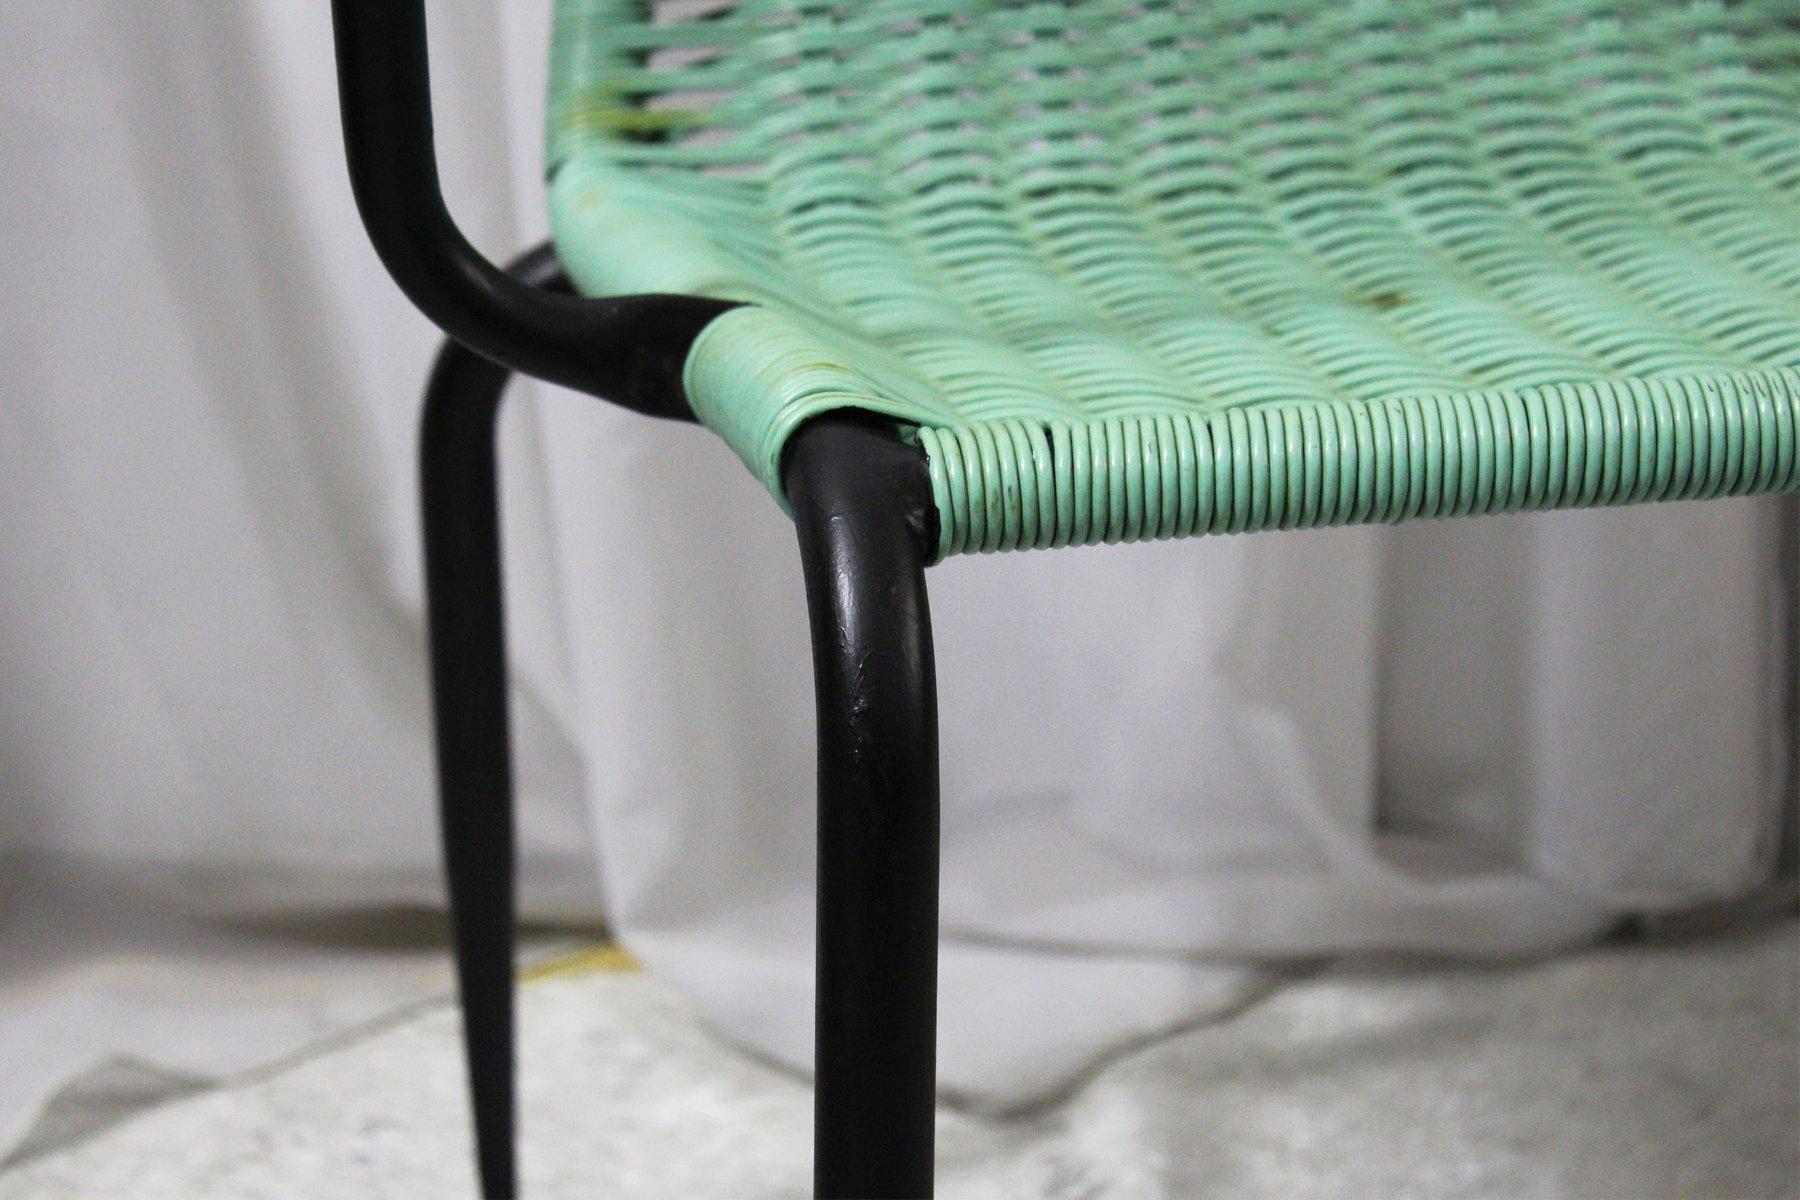 Sedie Intrecciate In Plastica.Mobili Da Giardino In Plastica Intrecciata Tavoli Da Giardino In